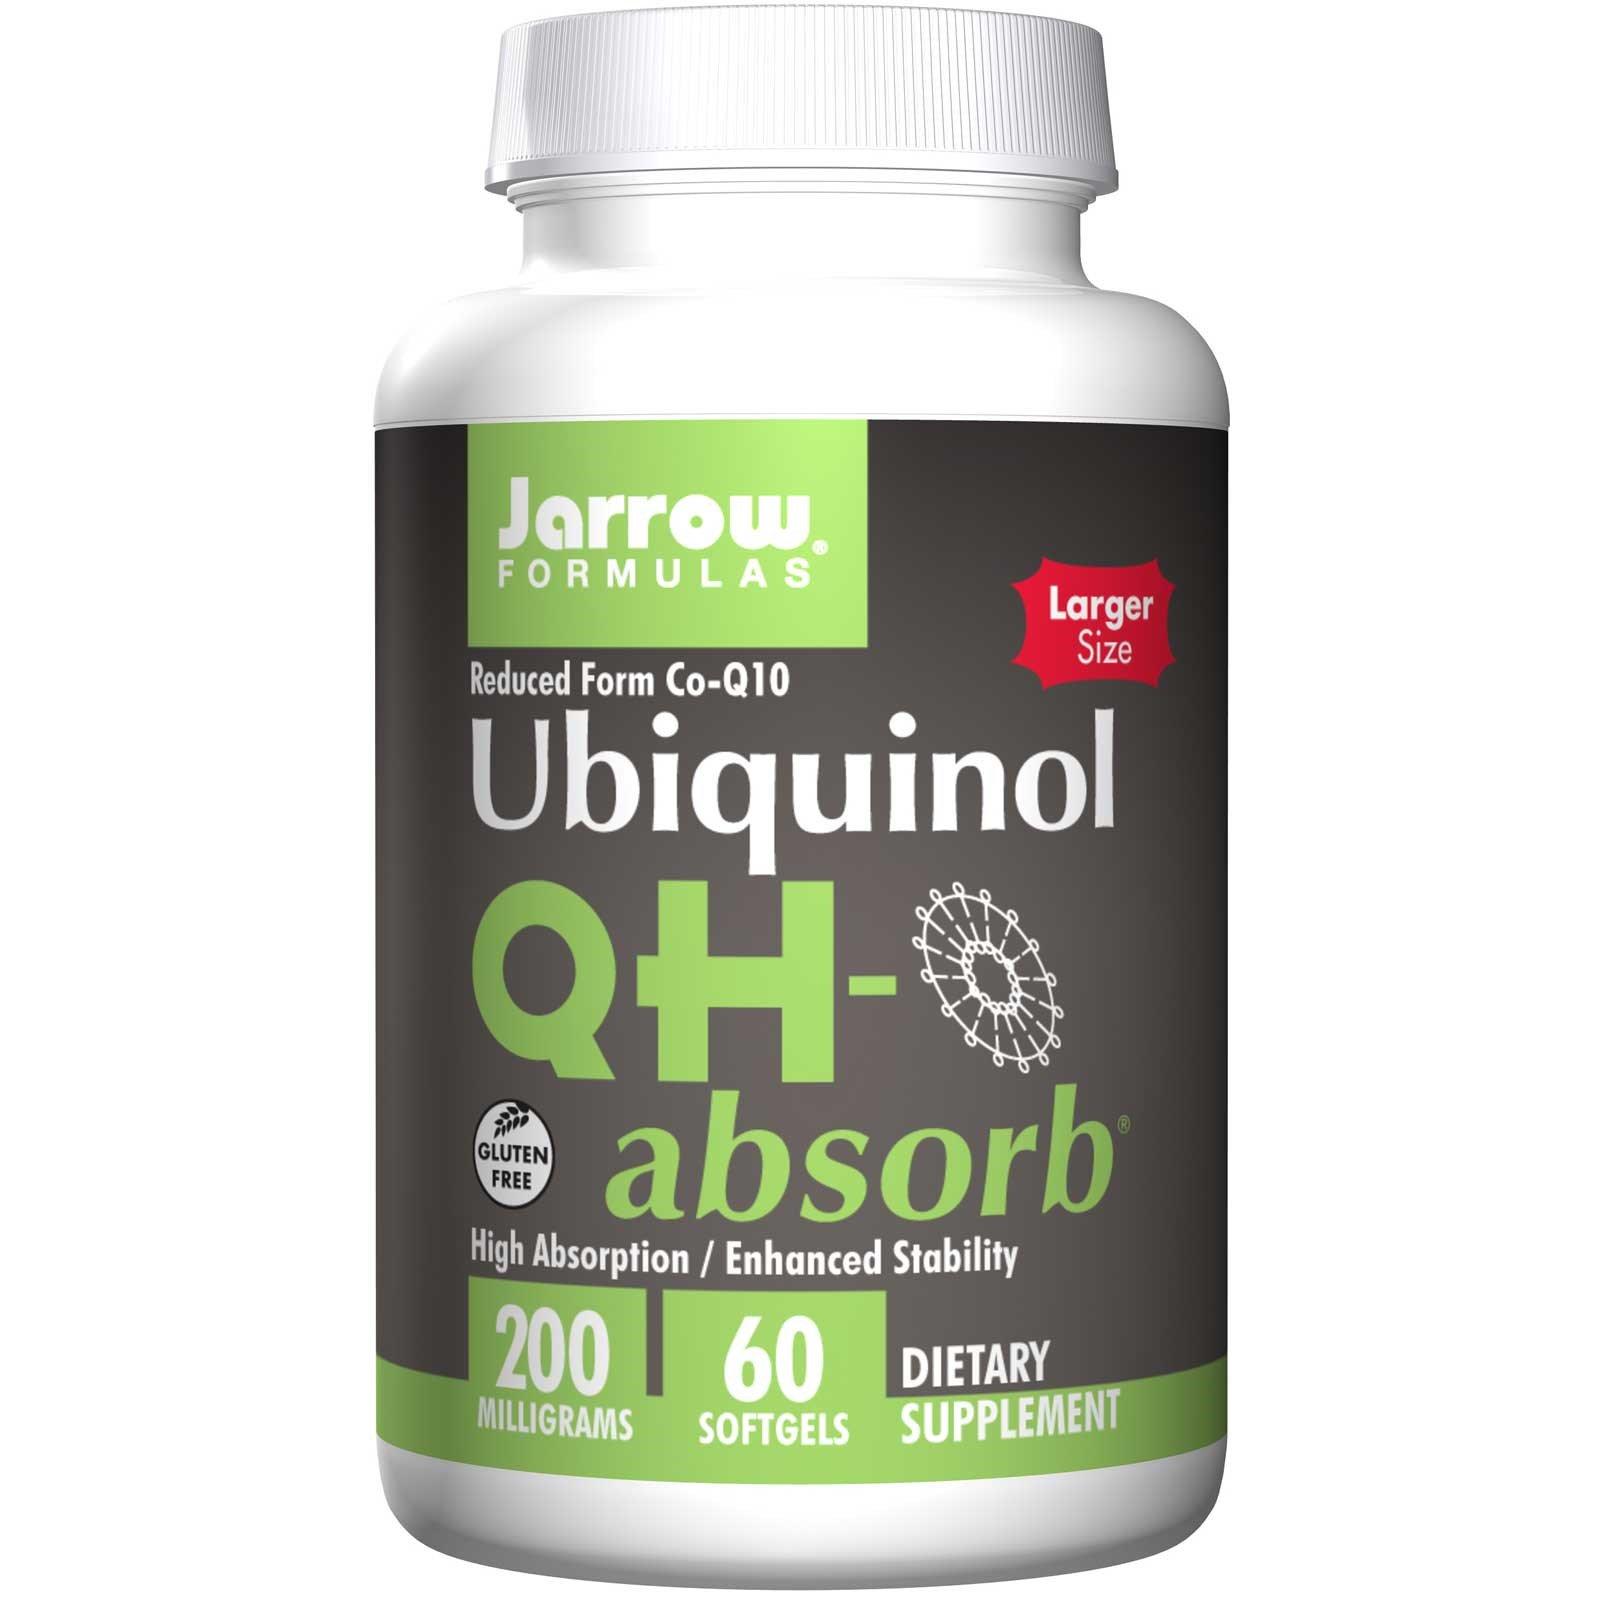 Image of Ubiquinol QH-Absorb 200 mg (60 softgels) - Jarrow Formulas 0790011060260